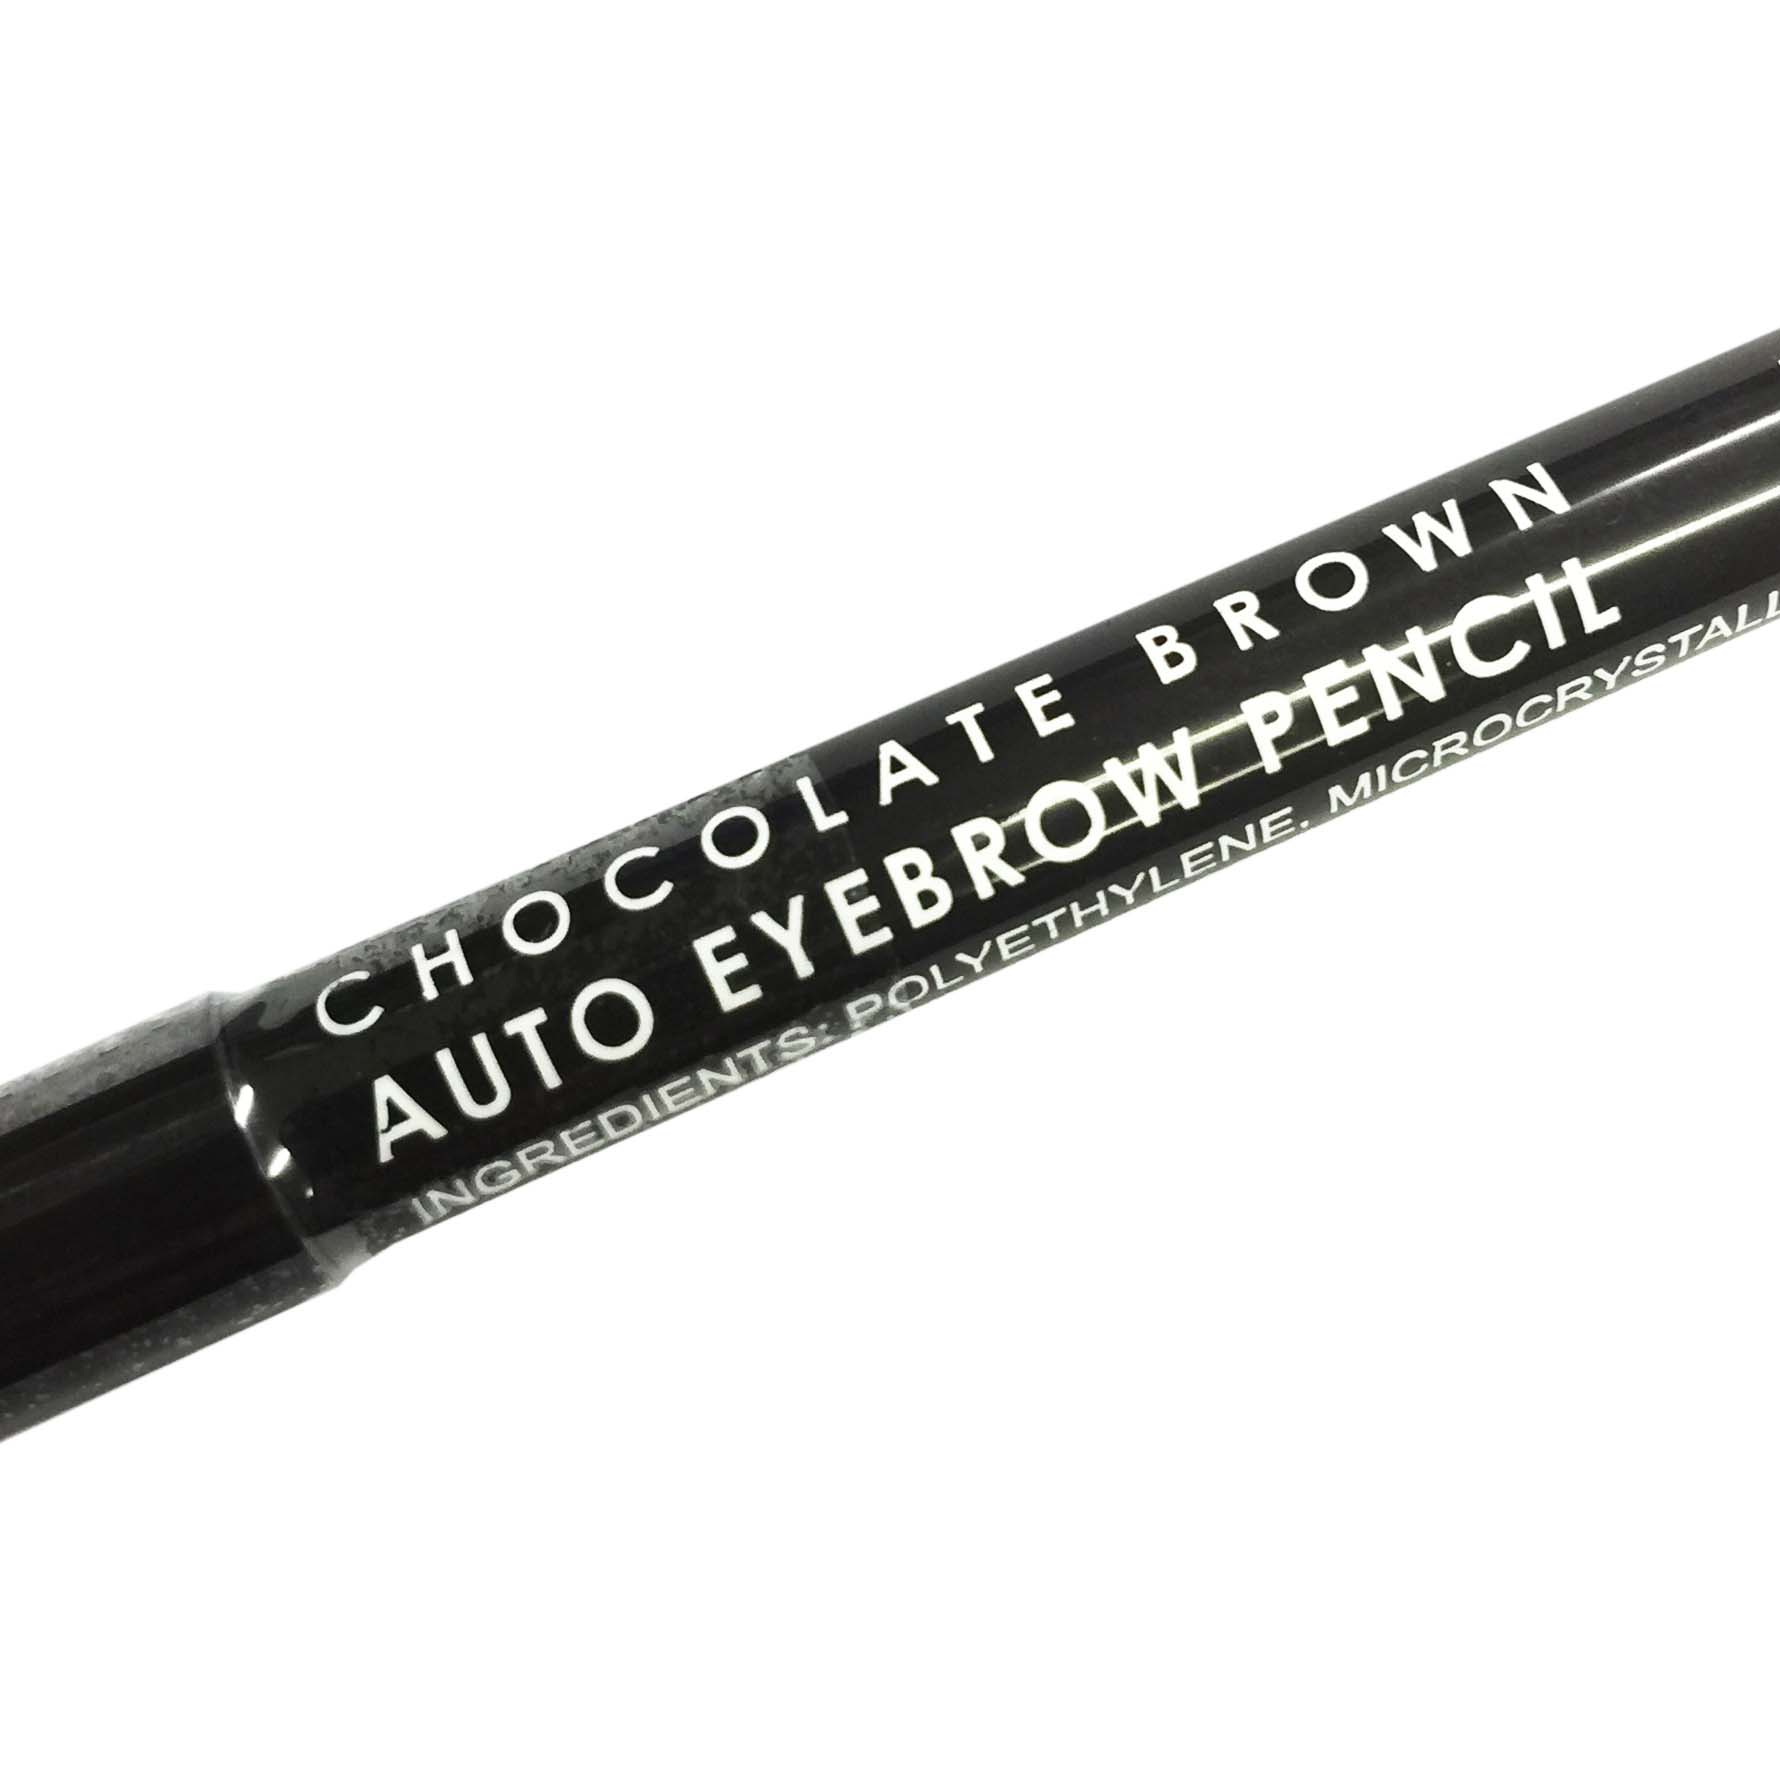 Exposed Cosmetics – Auto Brow Pencil – Chocolate Brown